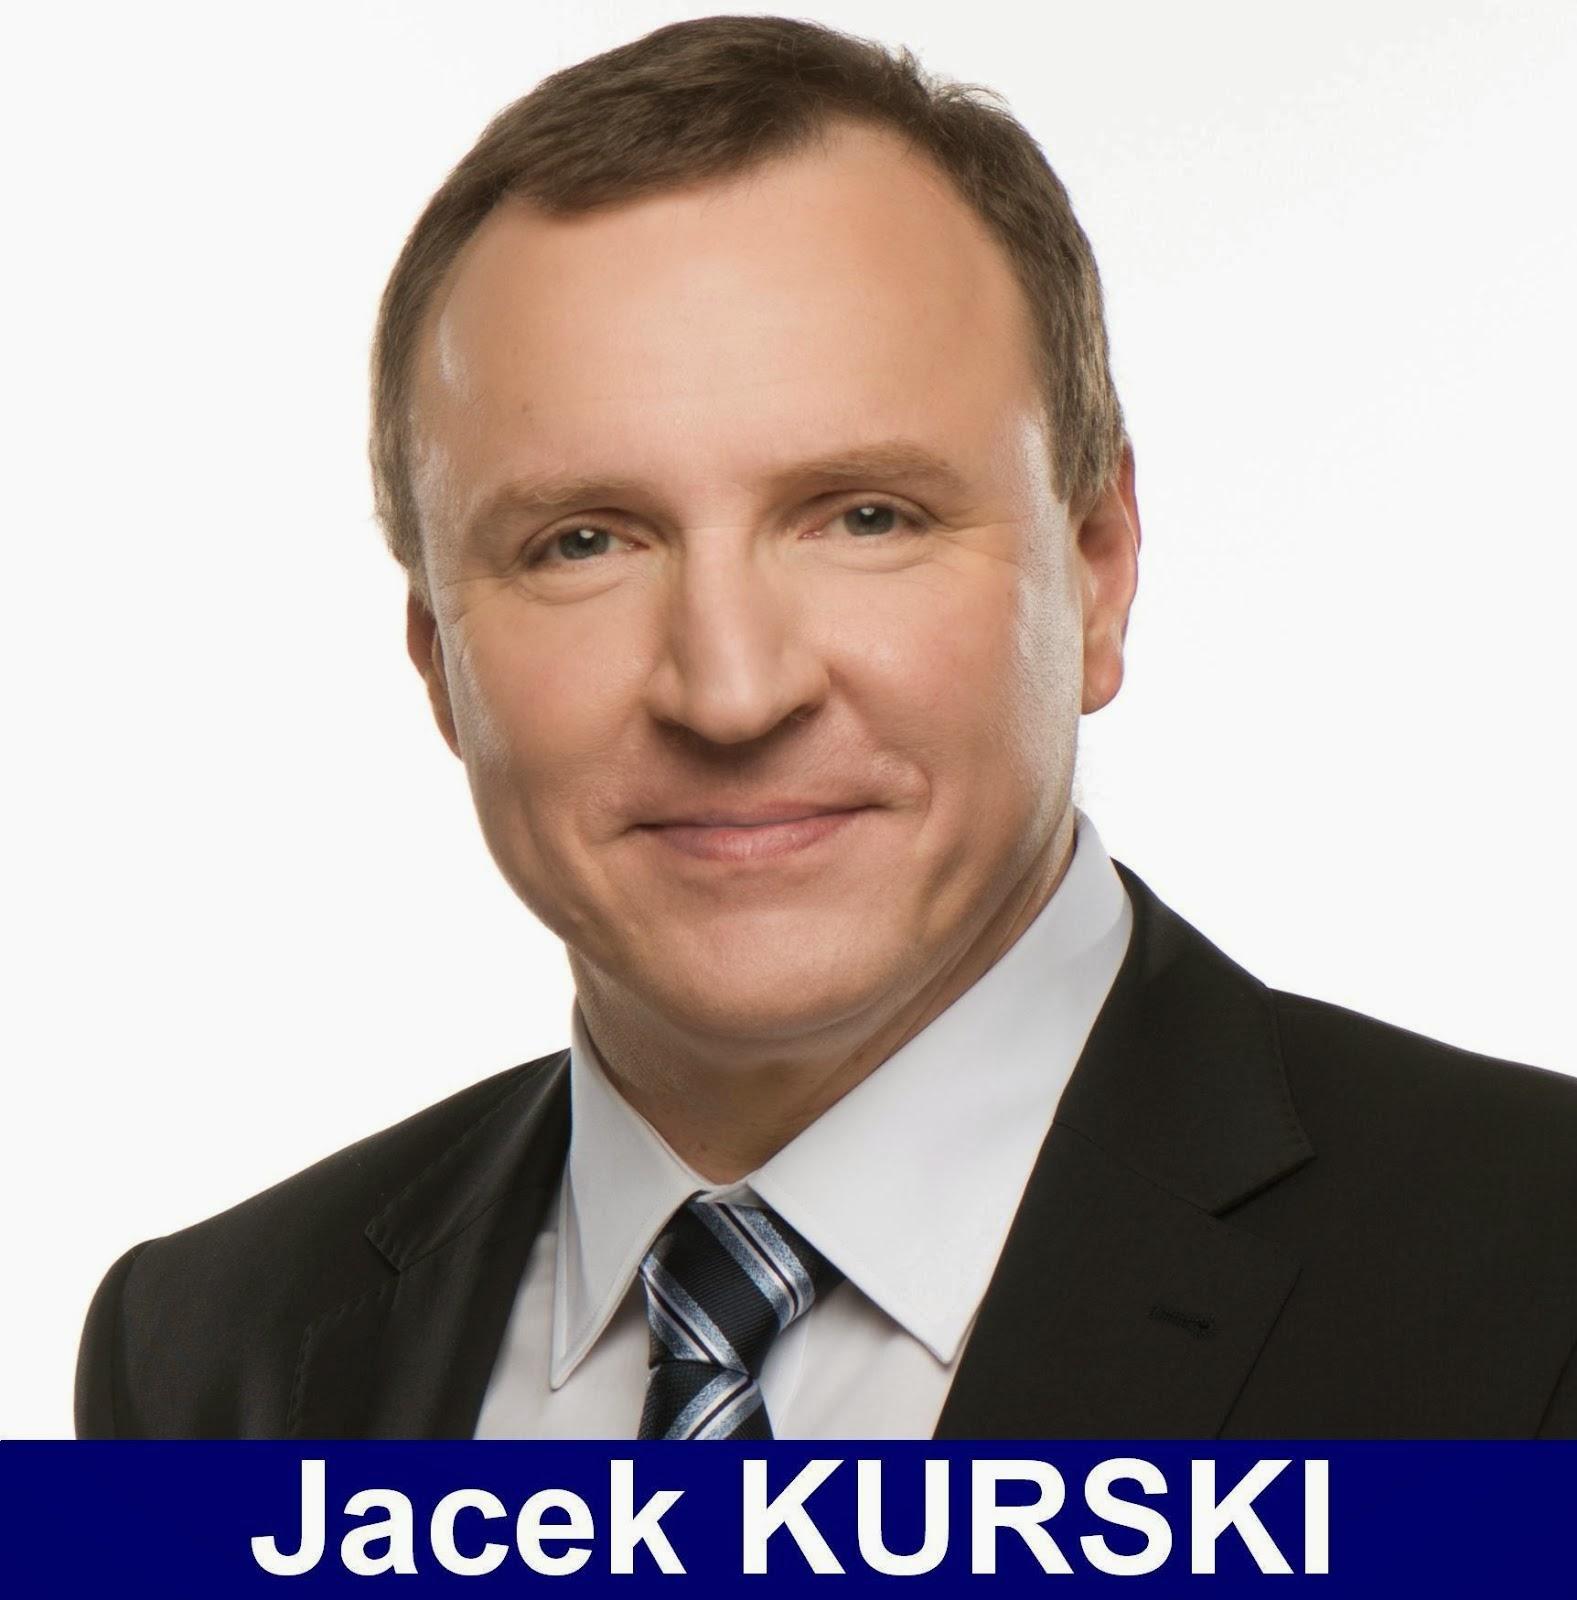 Jacek Kurski na facebooku